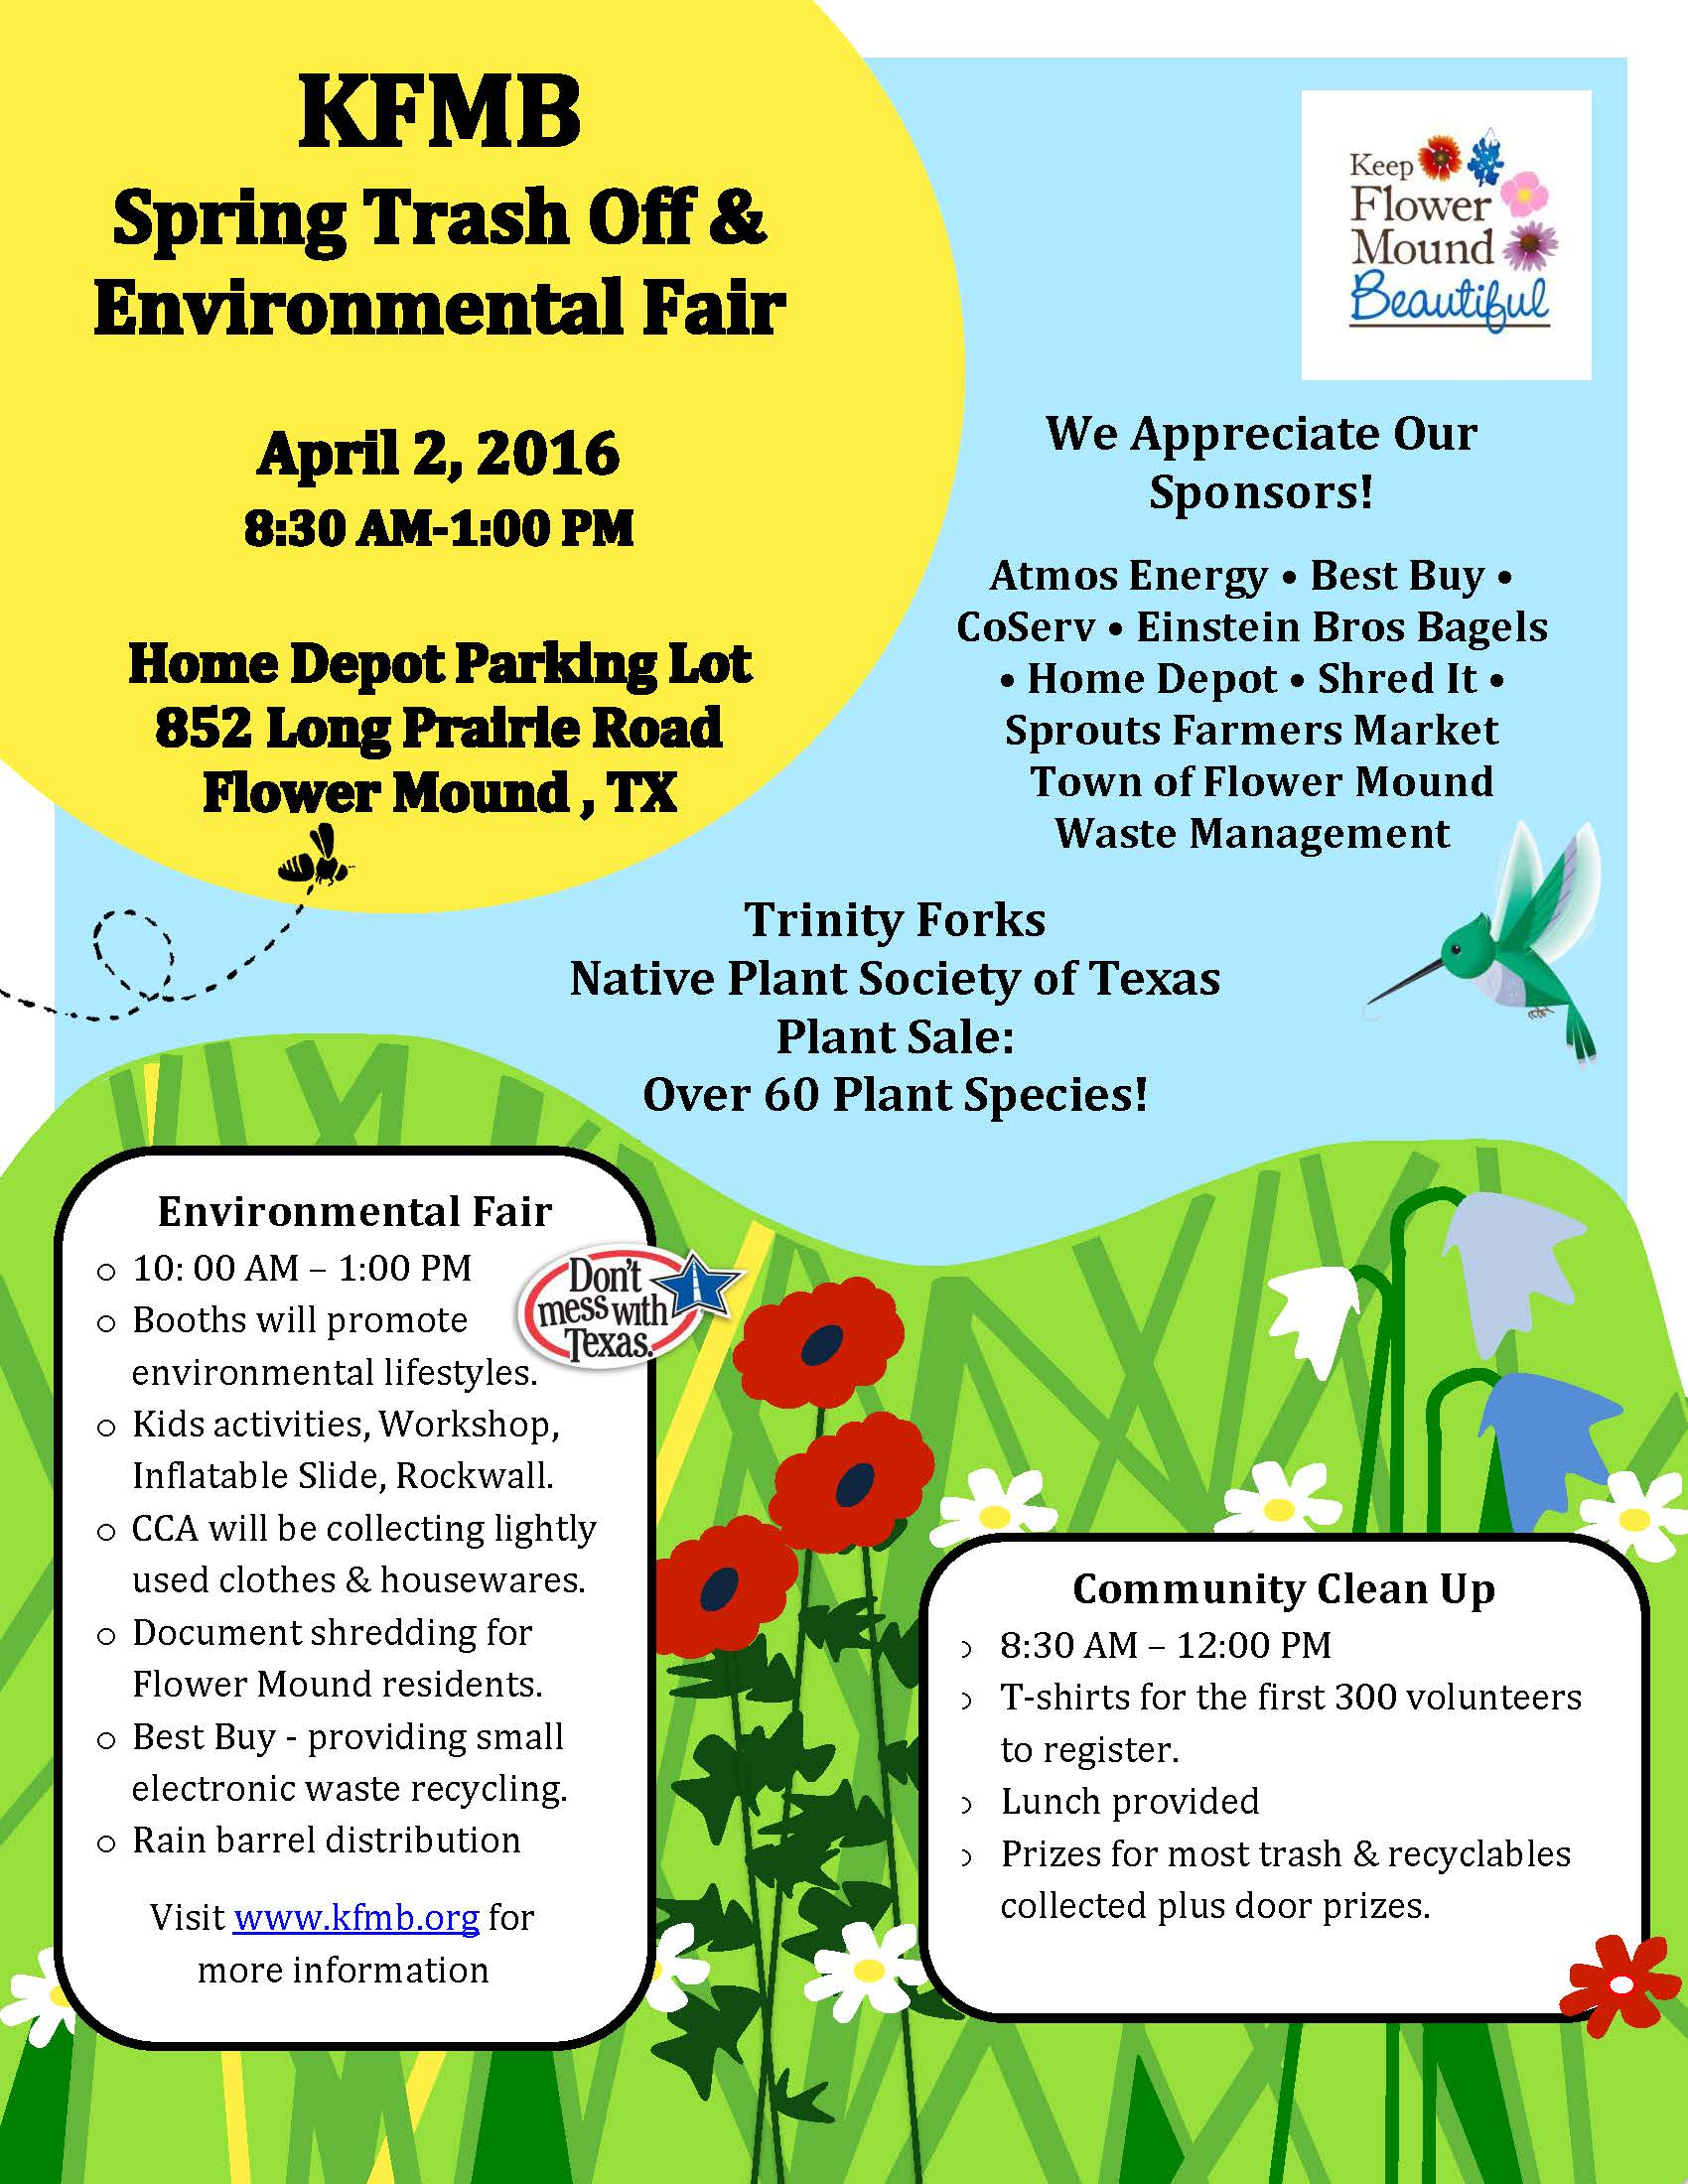 KFMB Spring Trash Off & Environmental Fair